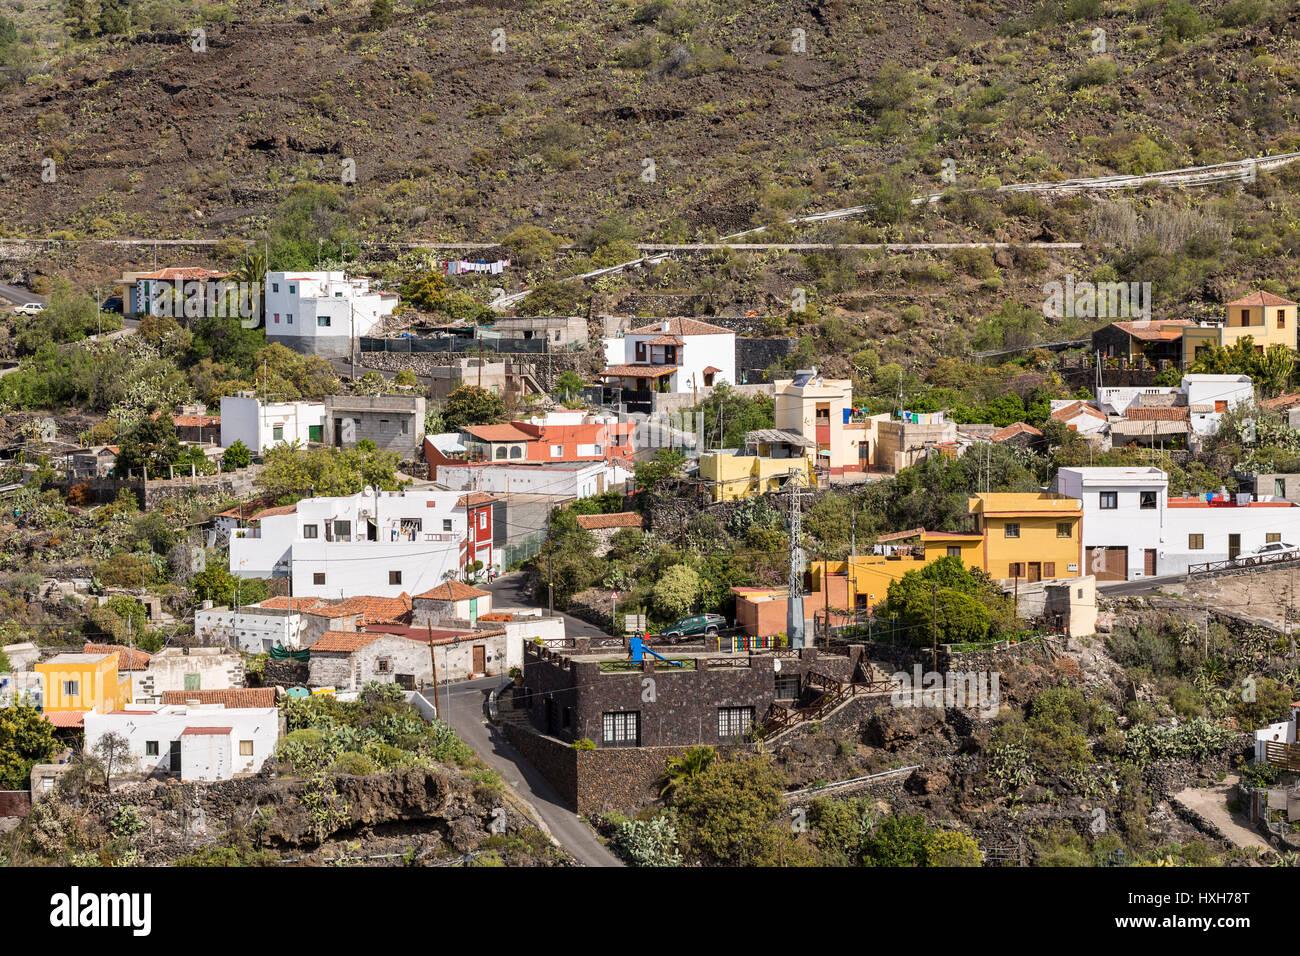 Farmhouses fincas in the village of aripe guia de isora - Guia de tenerife pdf ...